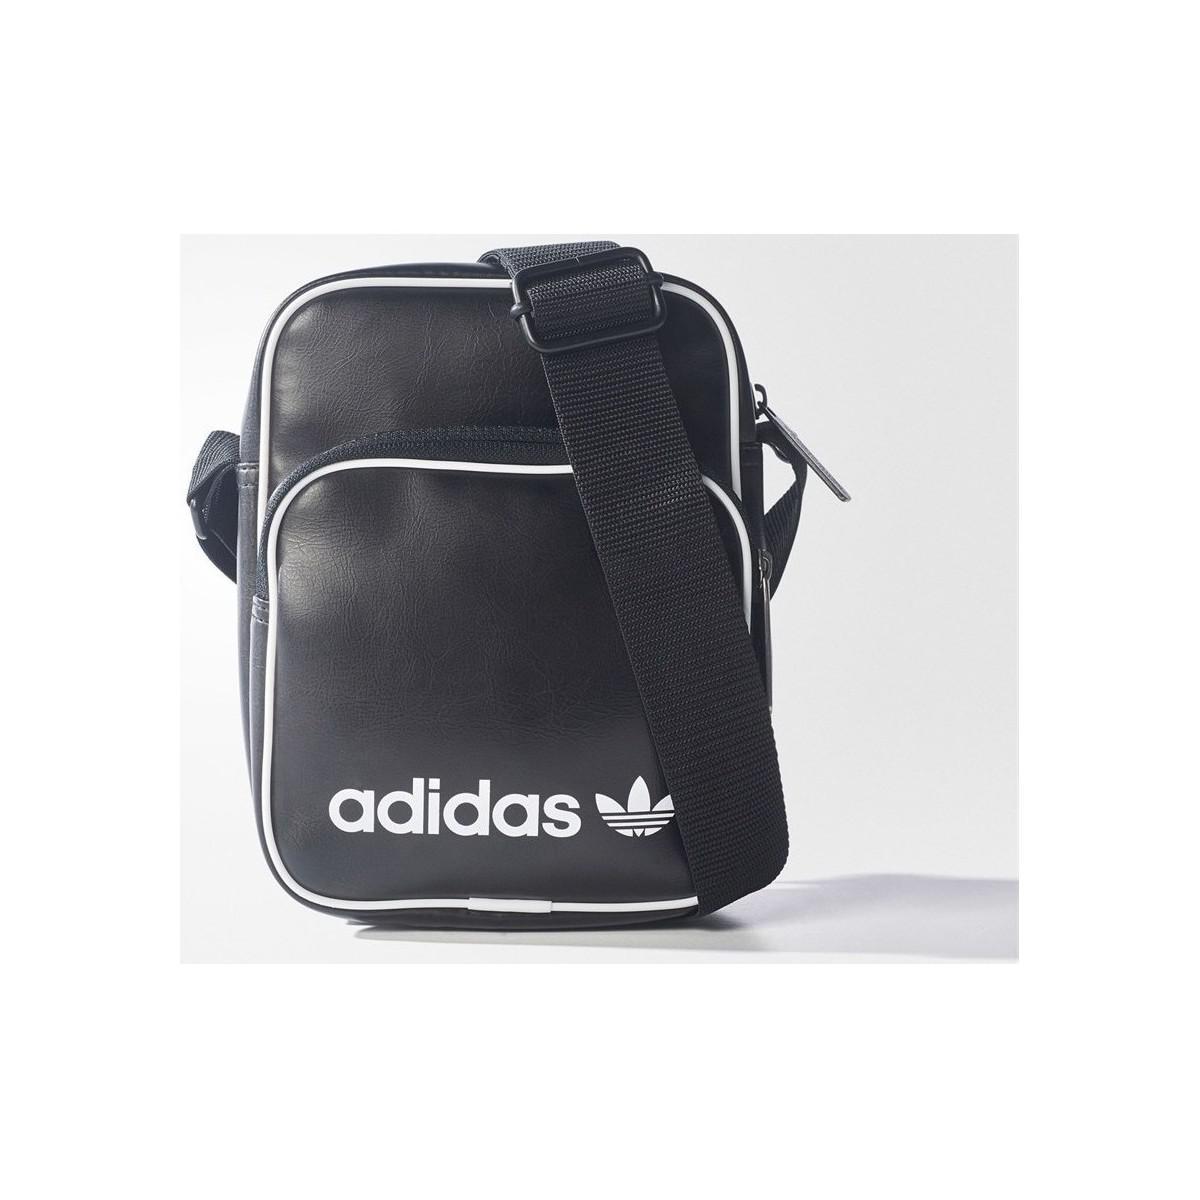 adidas Originals Mini Vintage Bag Men s Messenger Bag In Black in ... f21c2e58b9